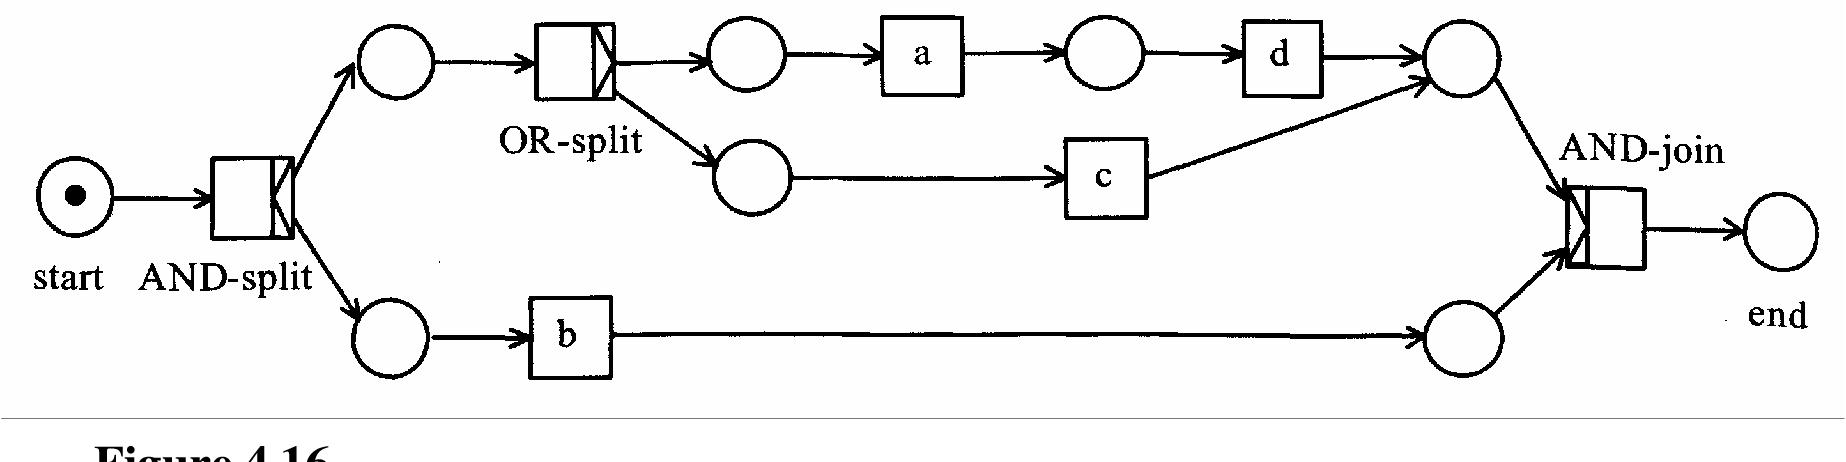 figure 4.16